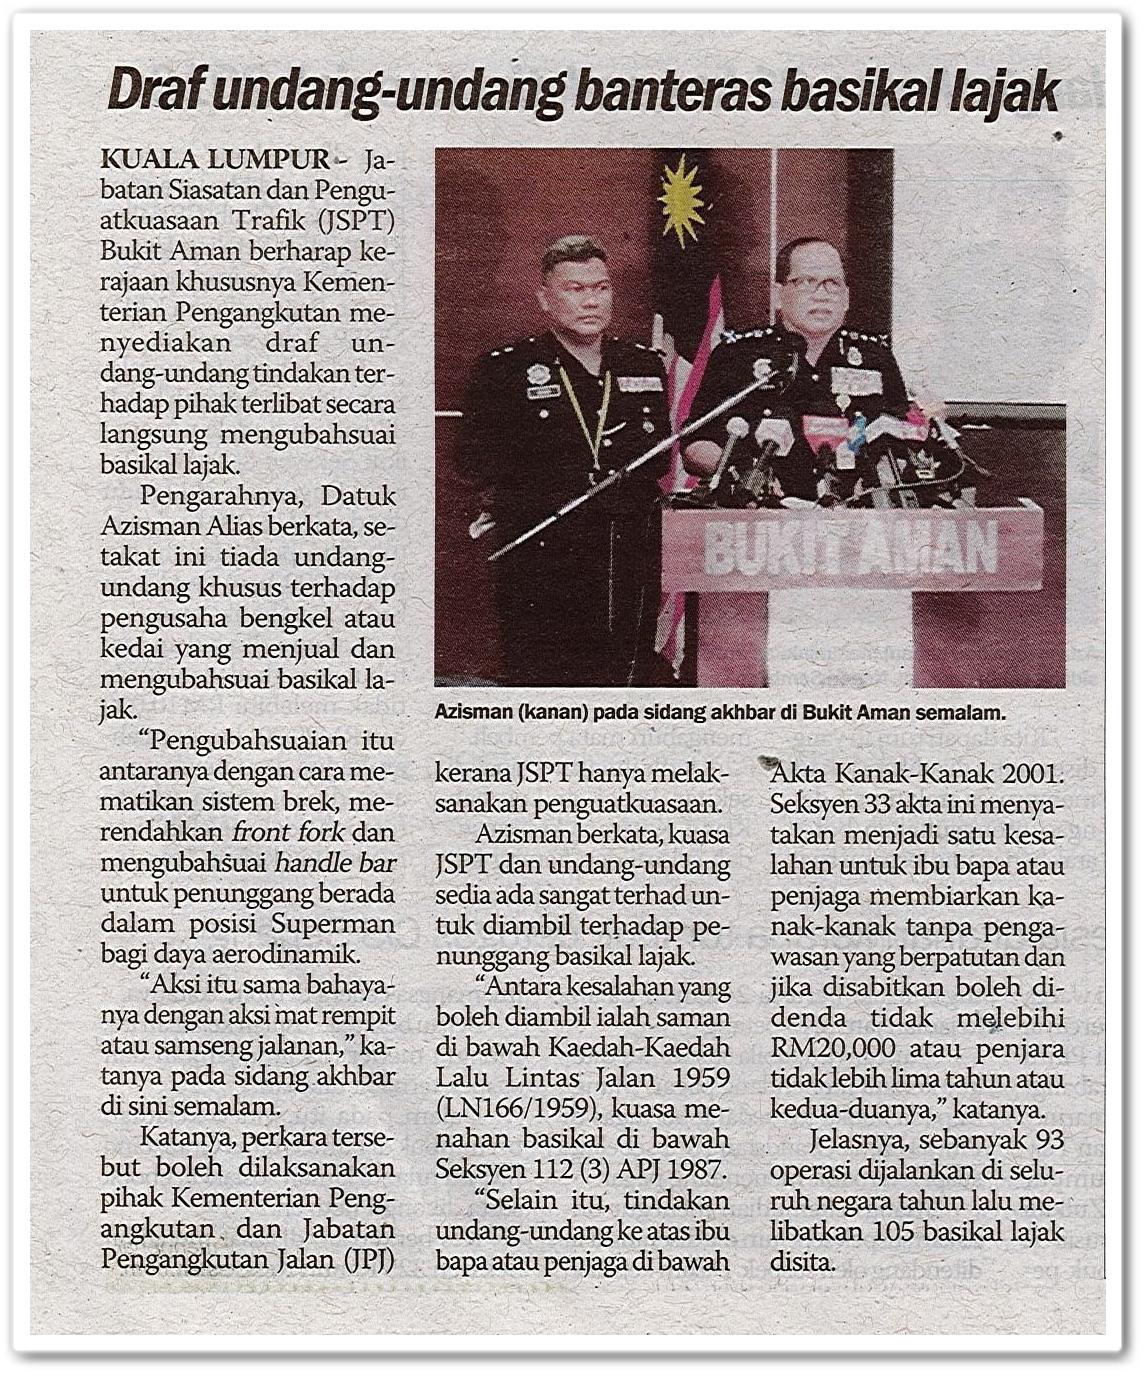 Draf undang-undang banteras basikal lajak - Keratan akhbar Sinar Harian 5 November 2019